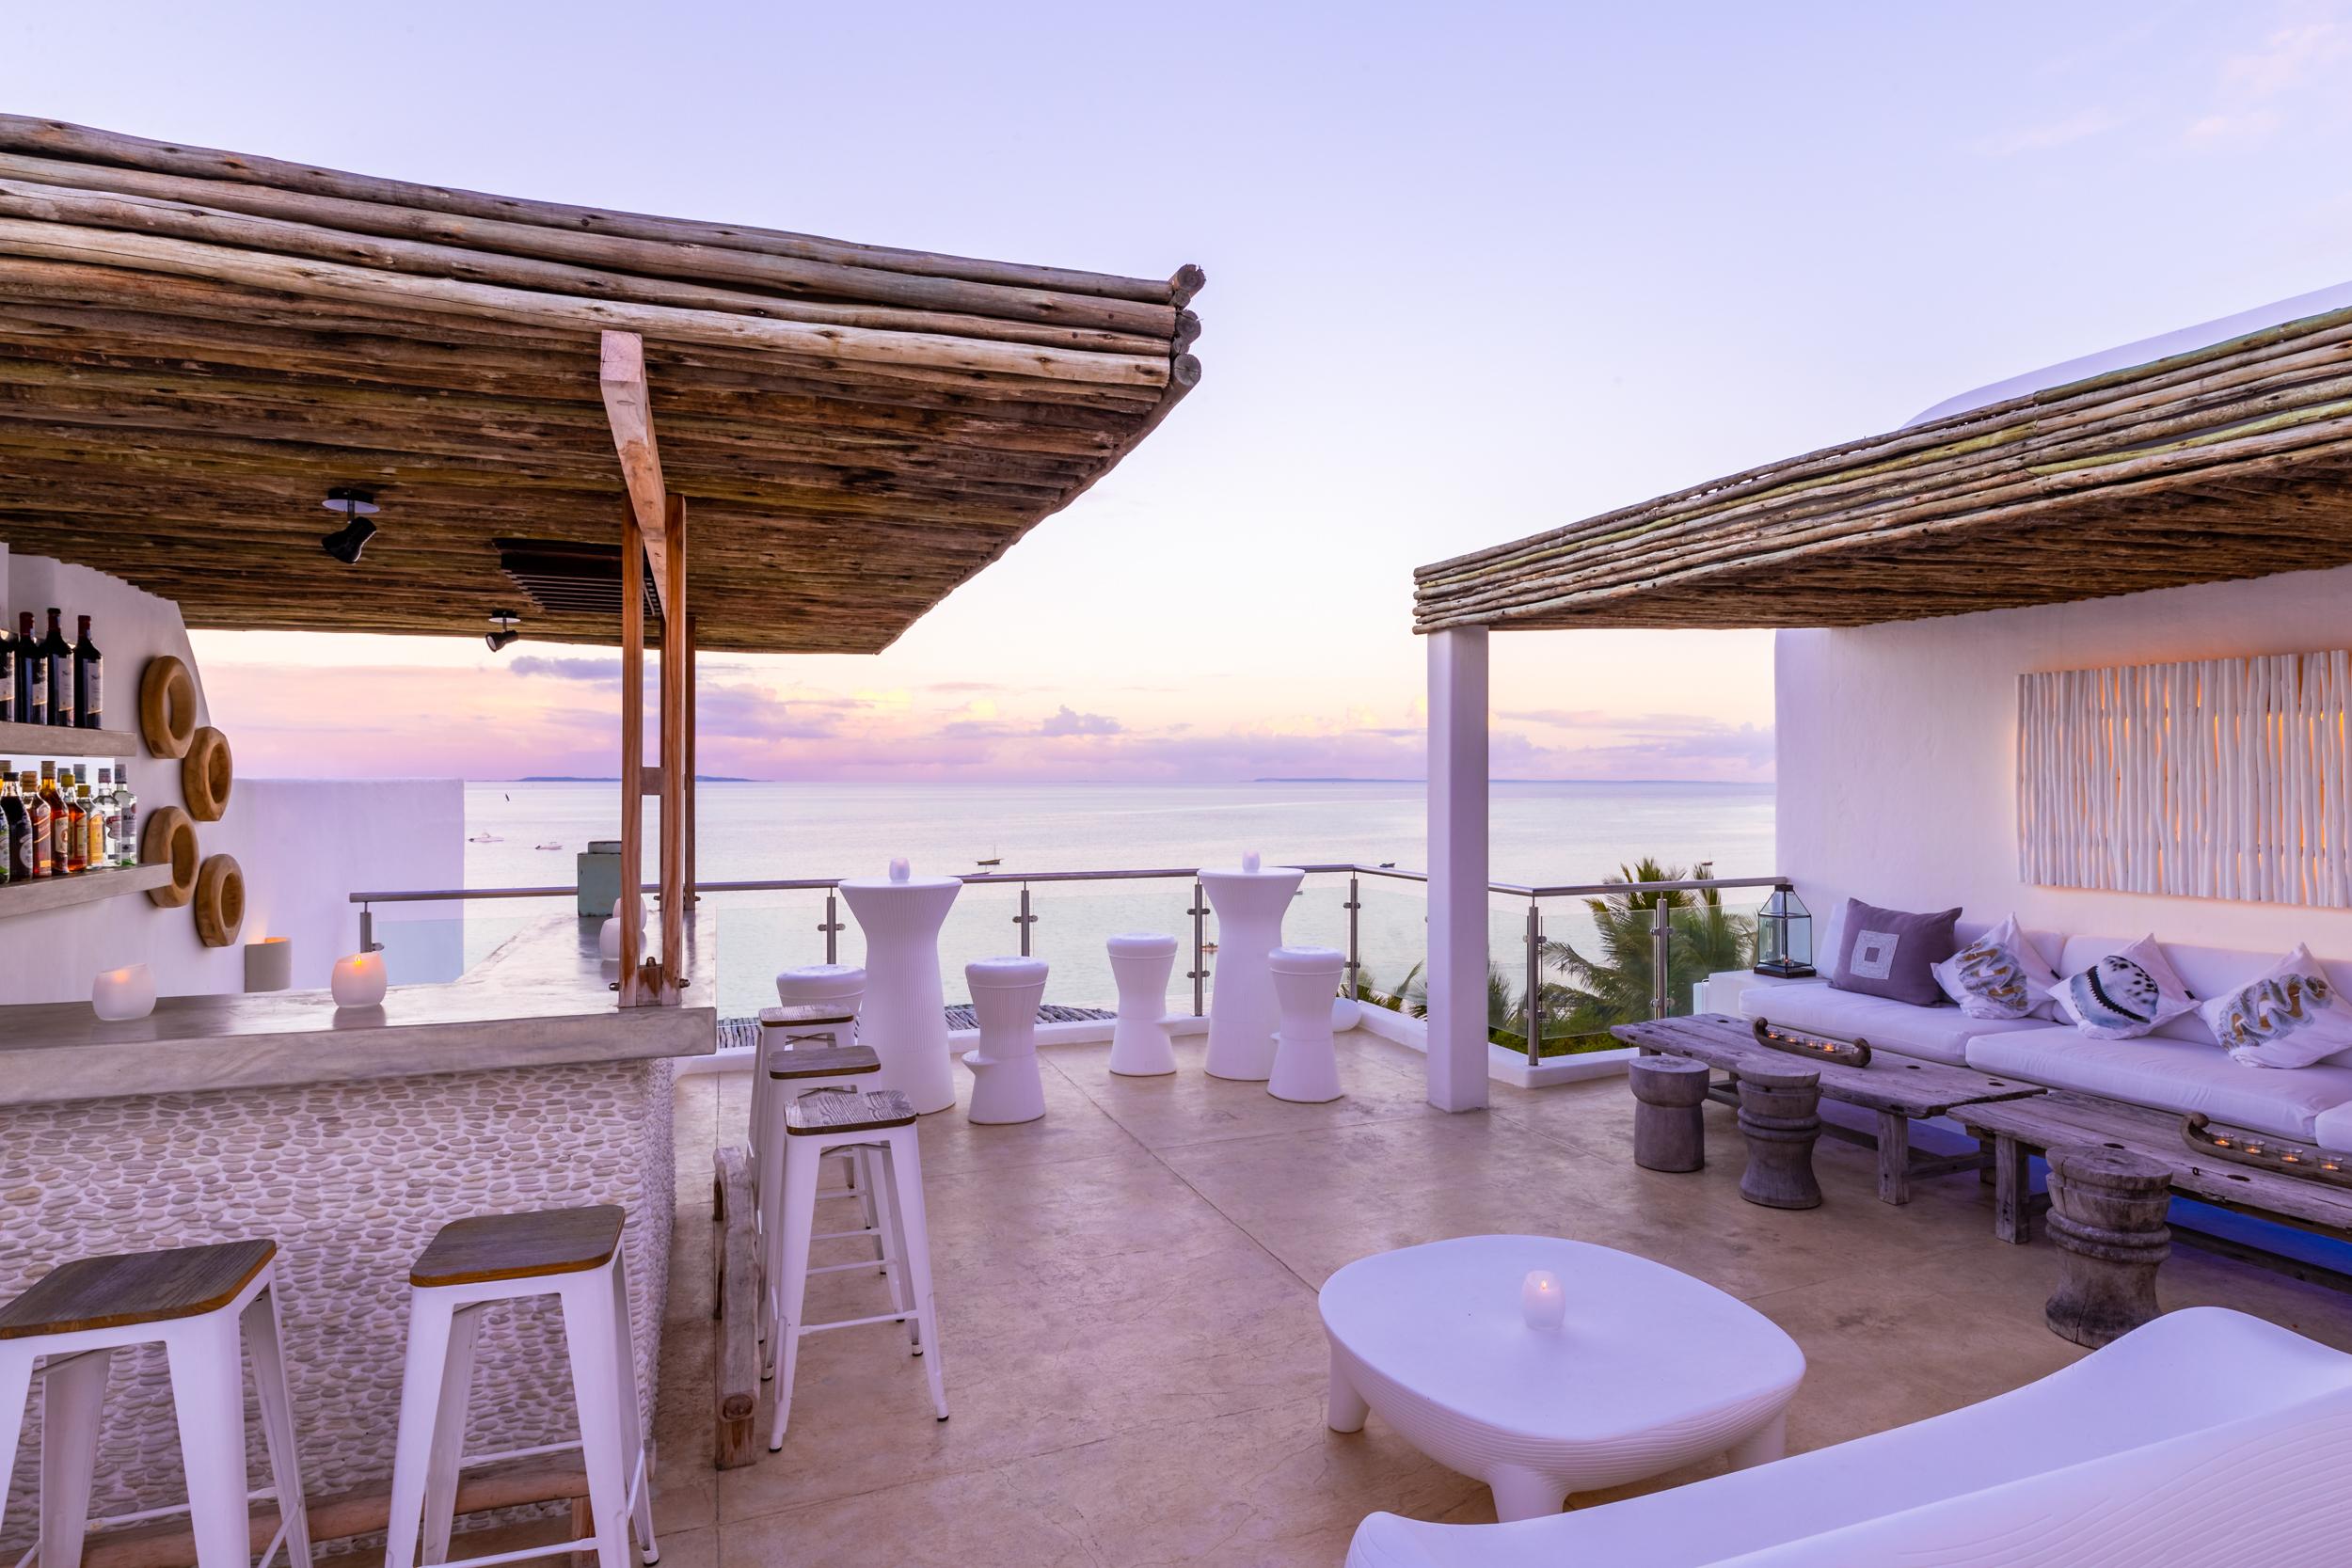 Santorini Mozambique - Sunset Bar - 2500px-7.jpg